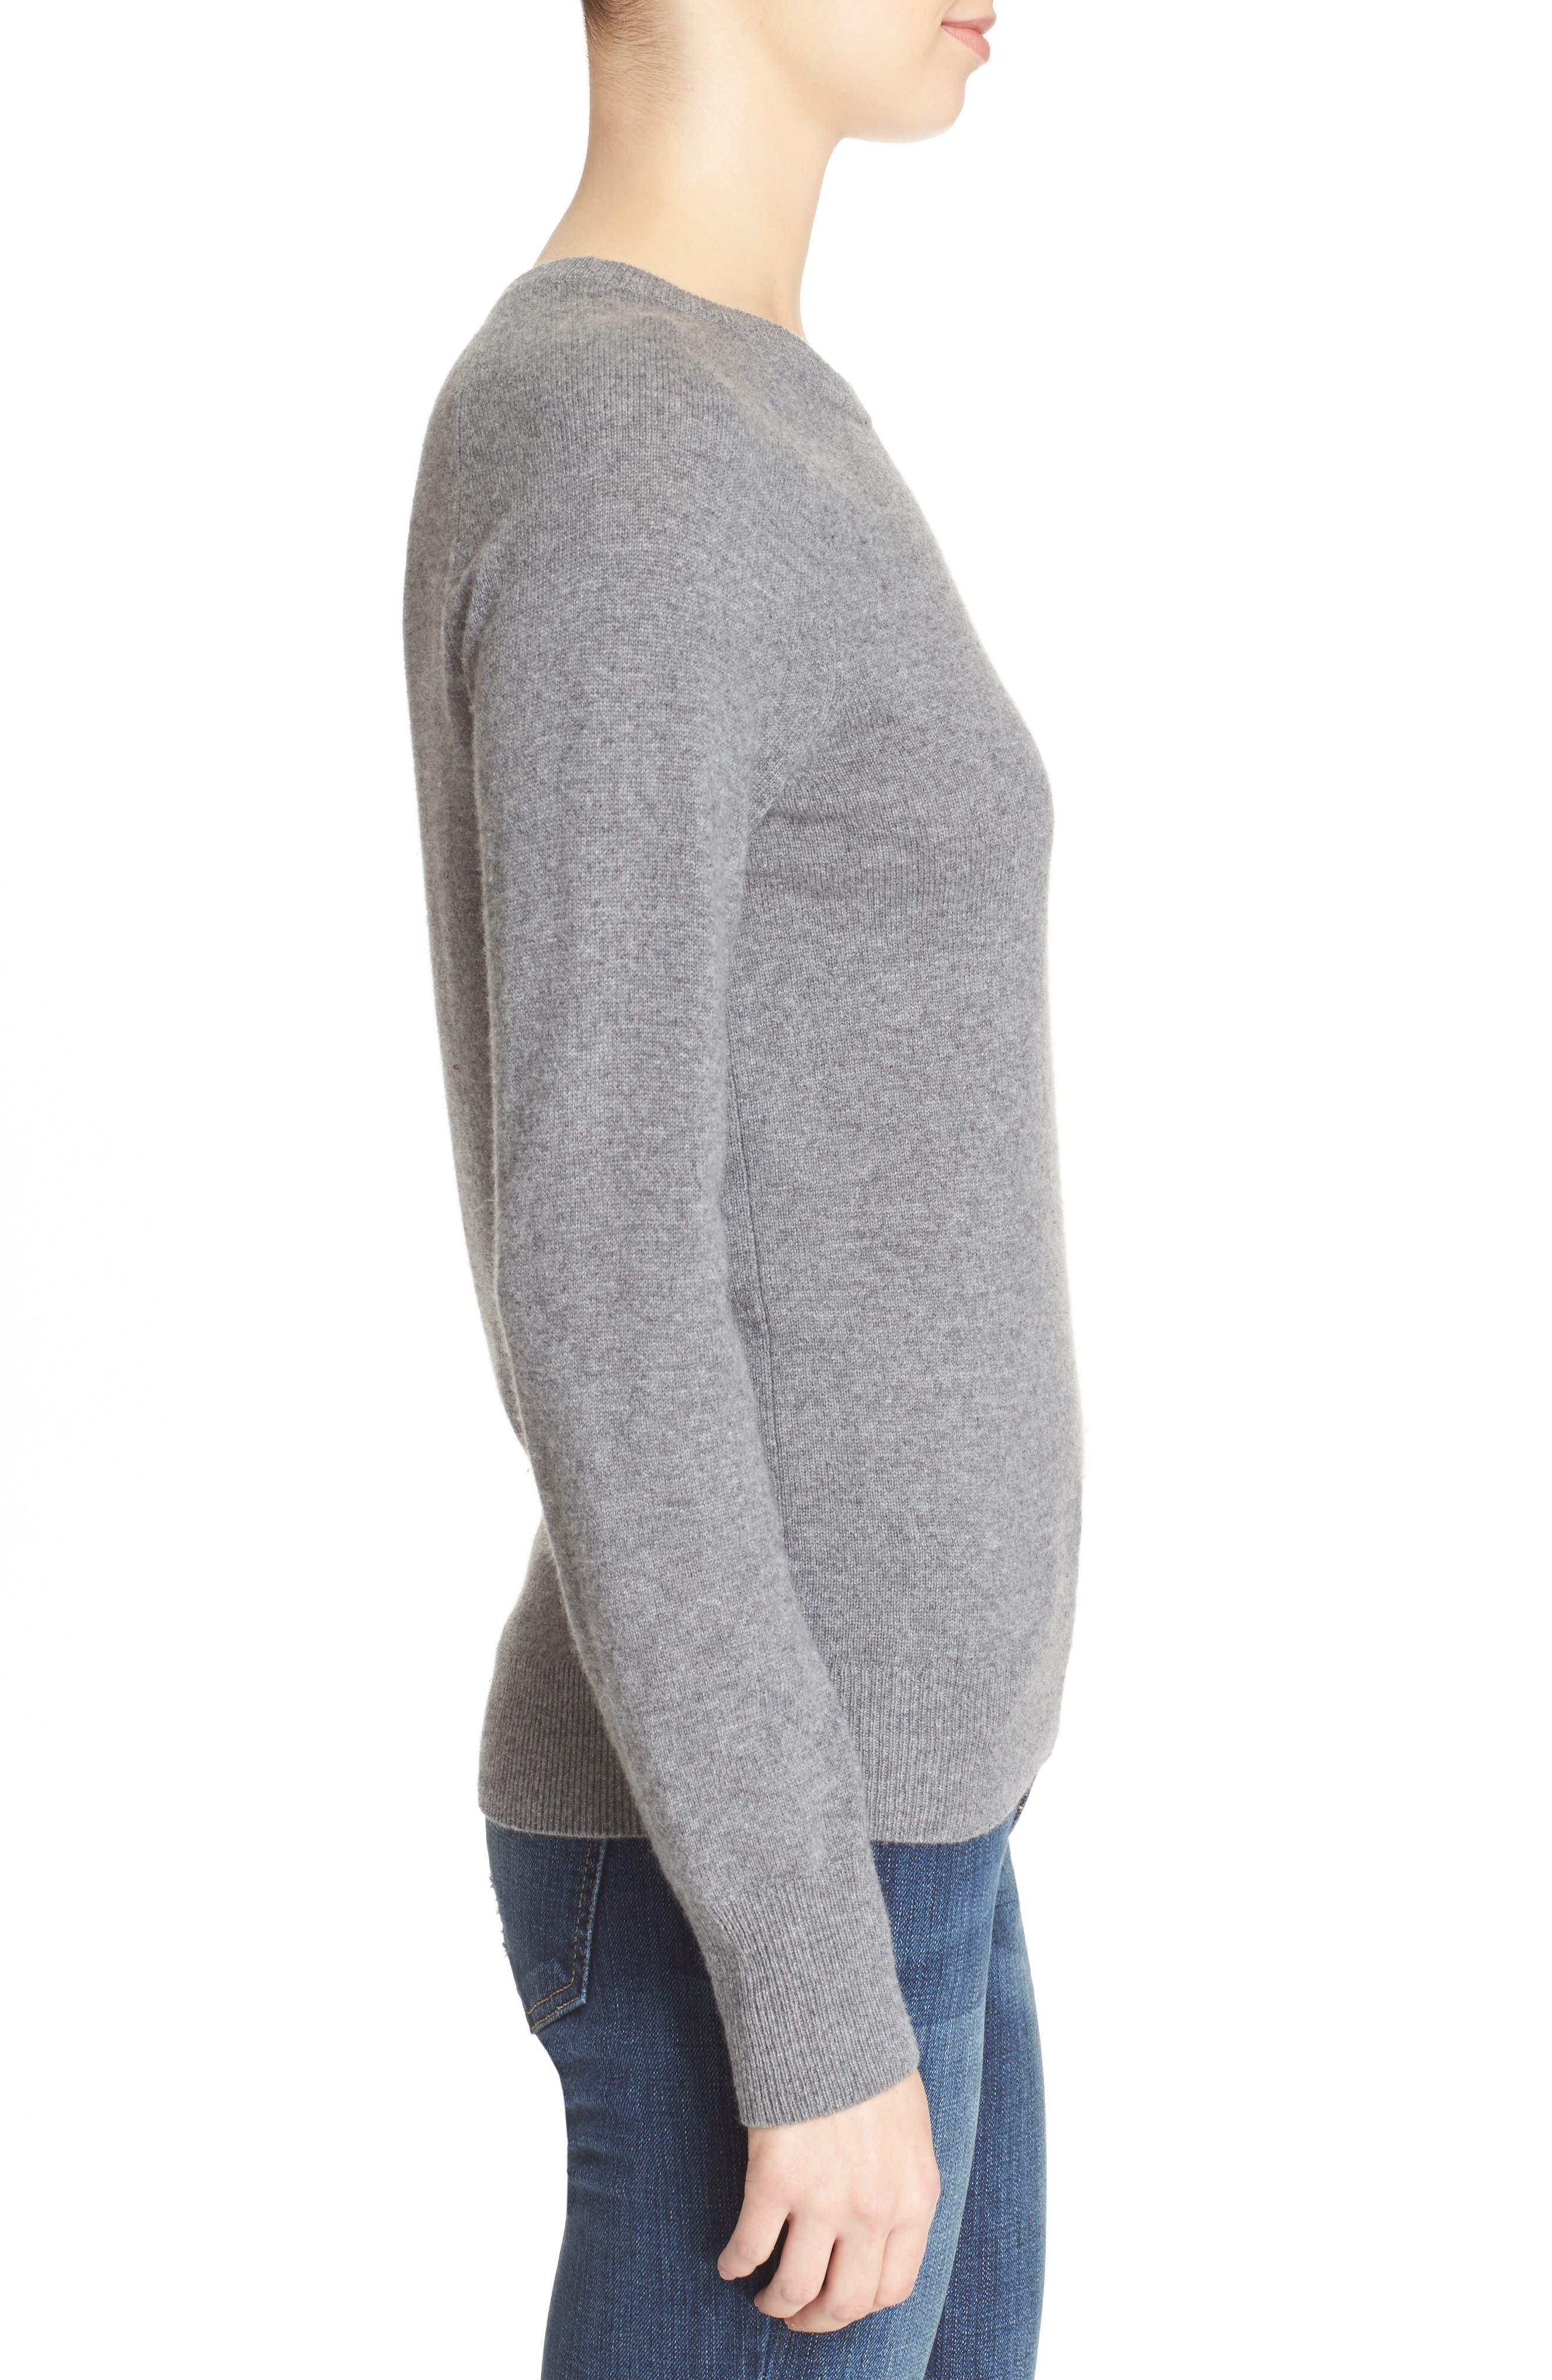 EQUIPMENT, 'Sloane' Crewneck Cashmere Sweater, Alternate thumbnail 3, color, 021